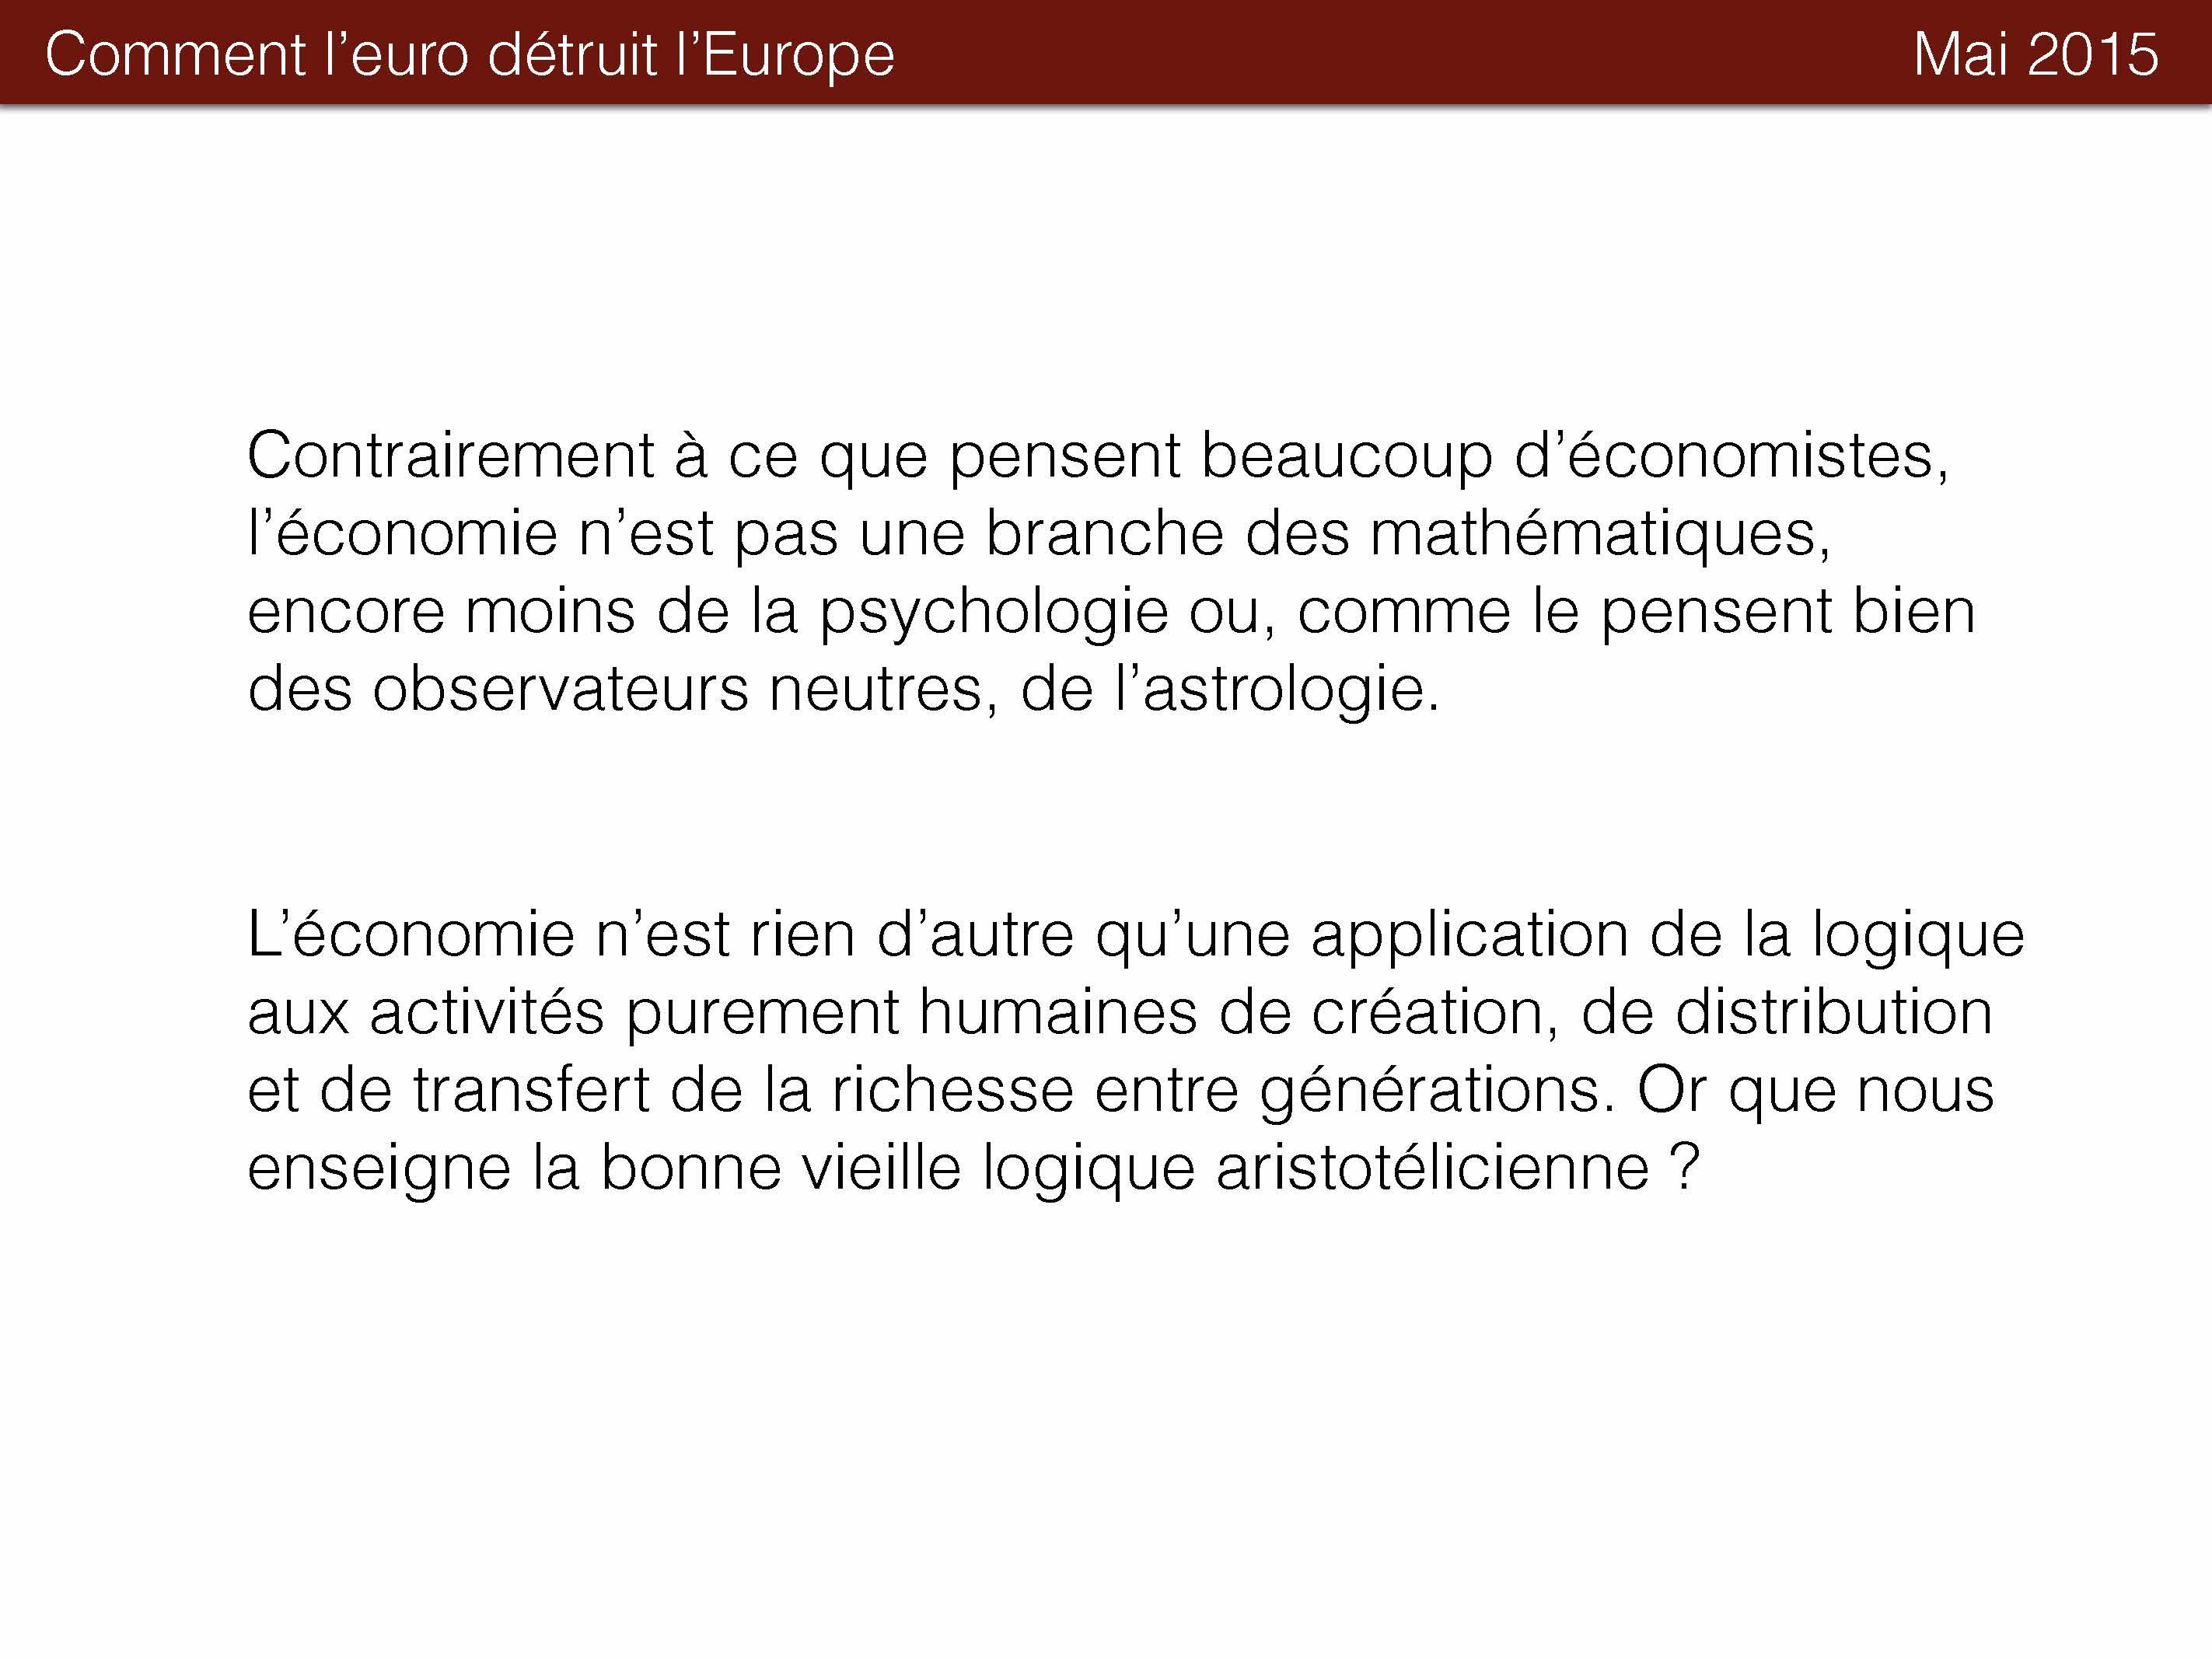 EUro_Page_02